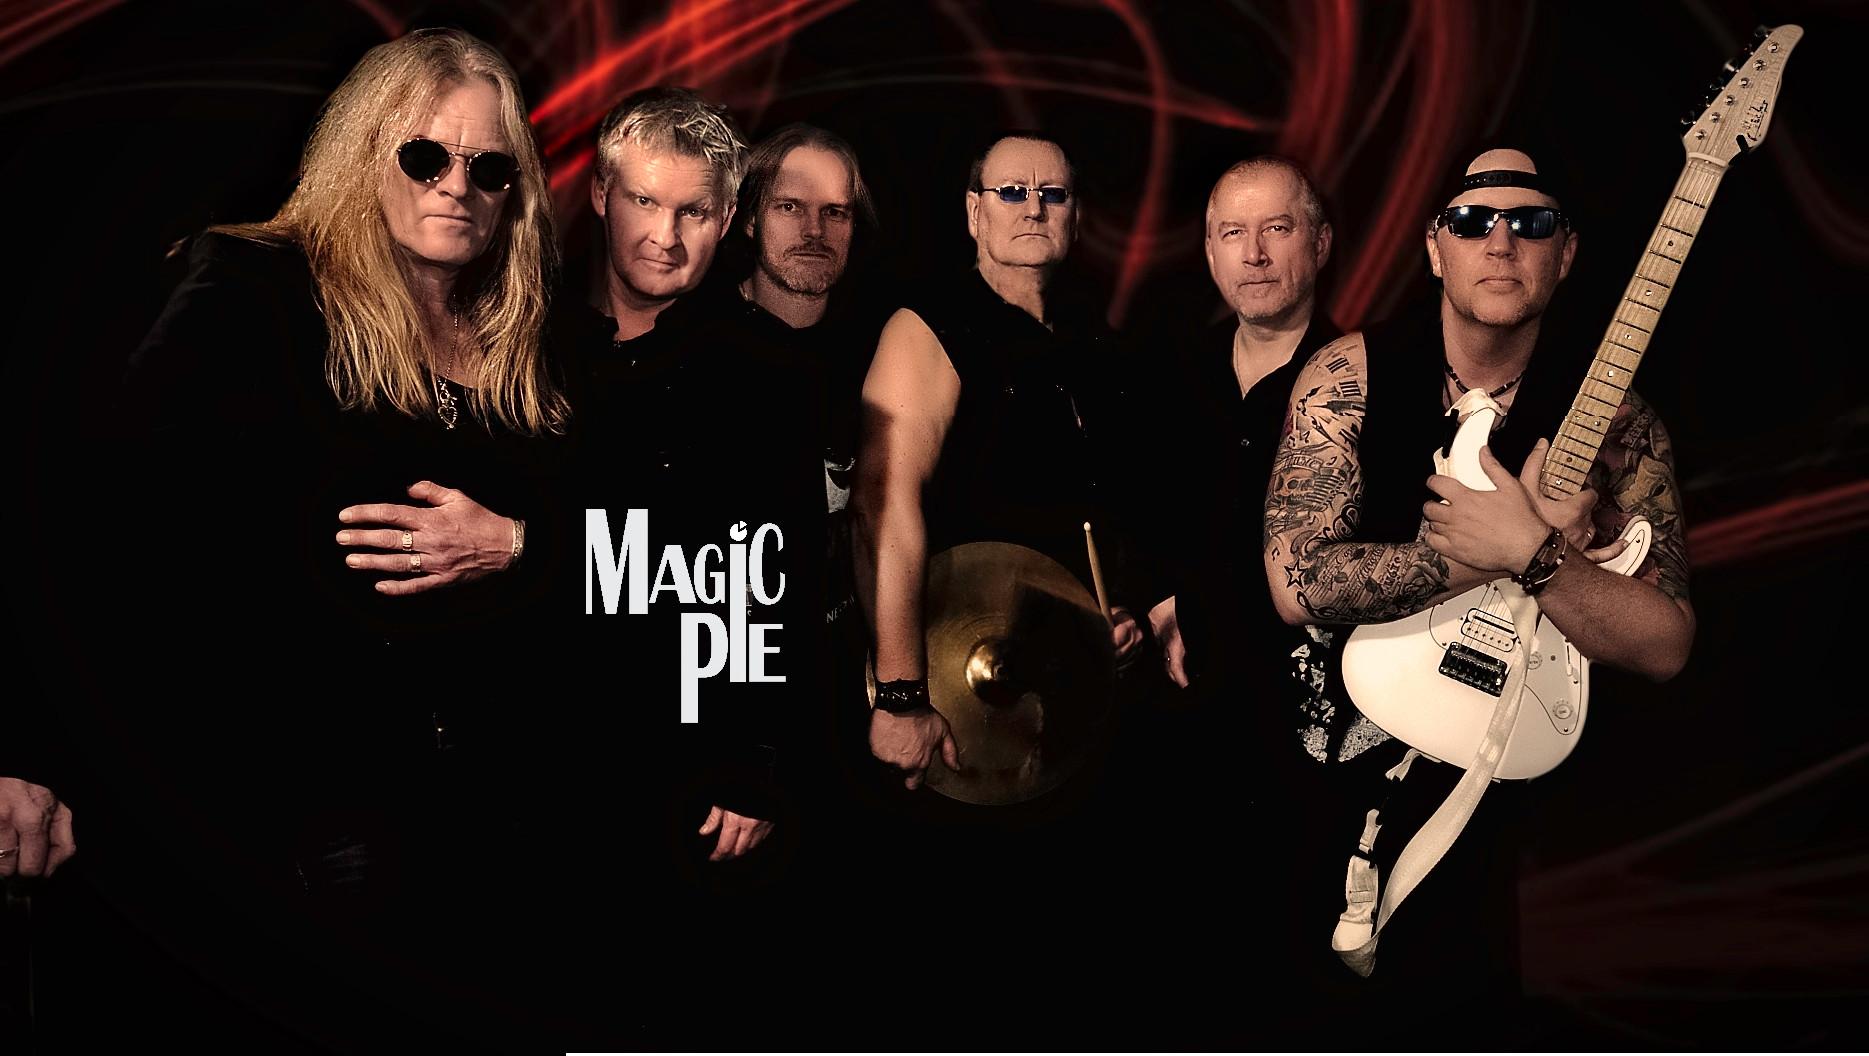 Contact | Magic Pie